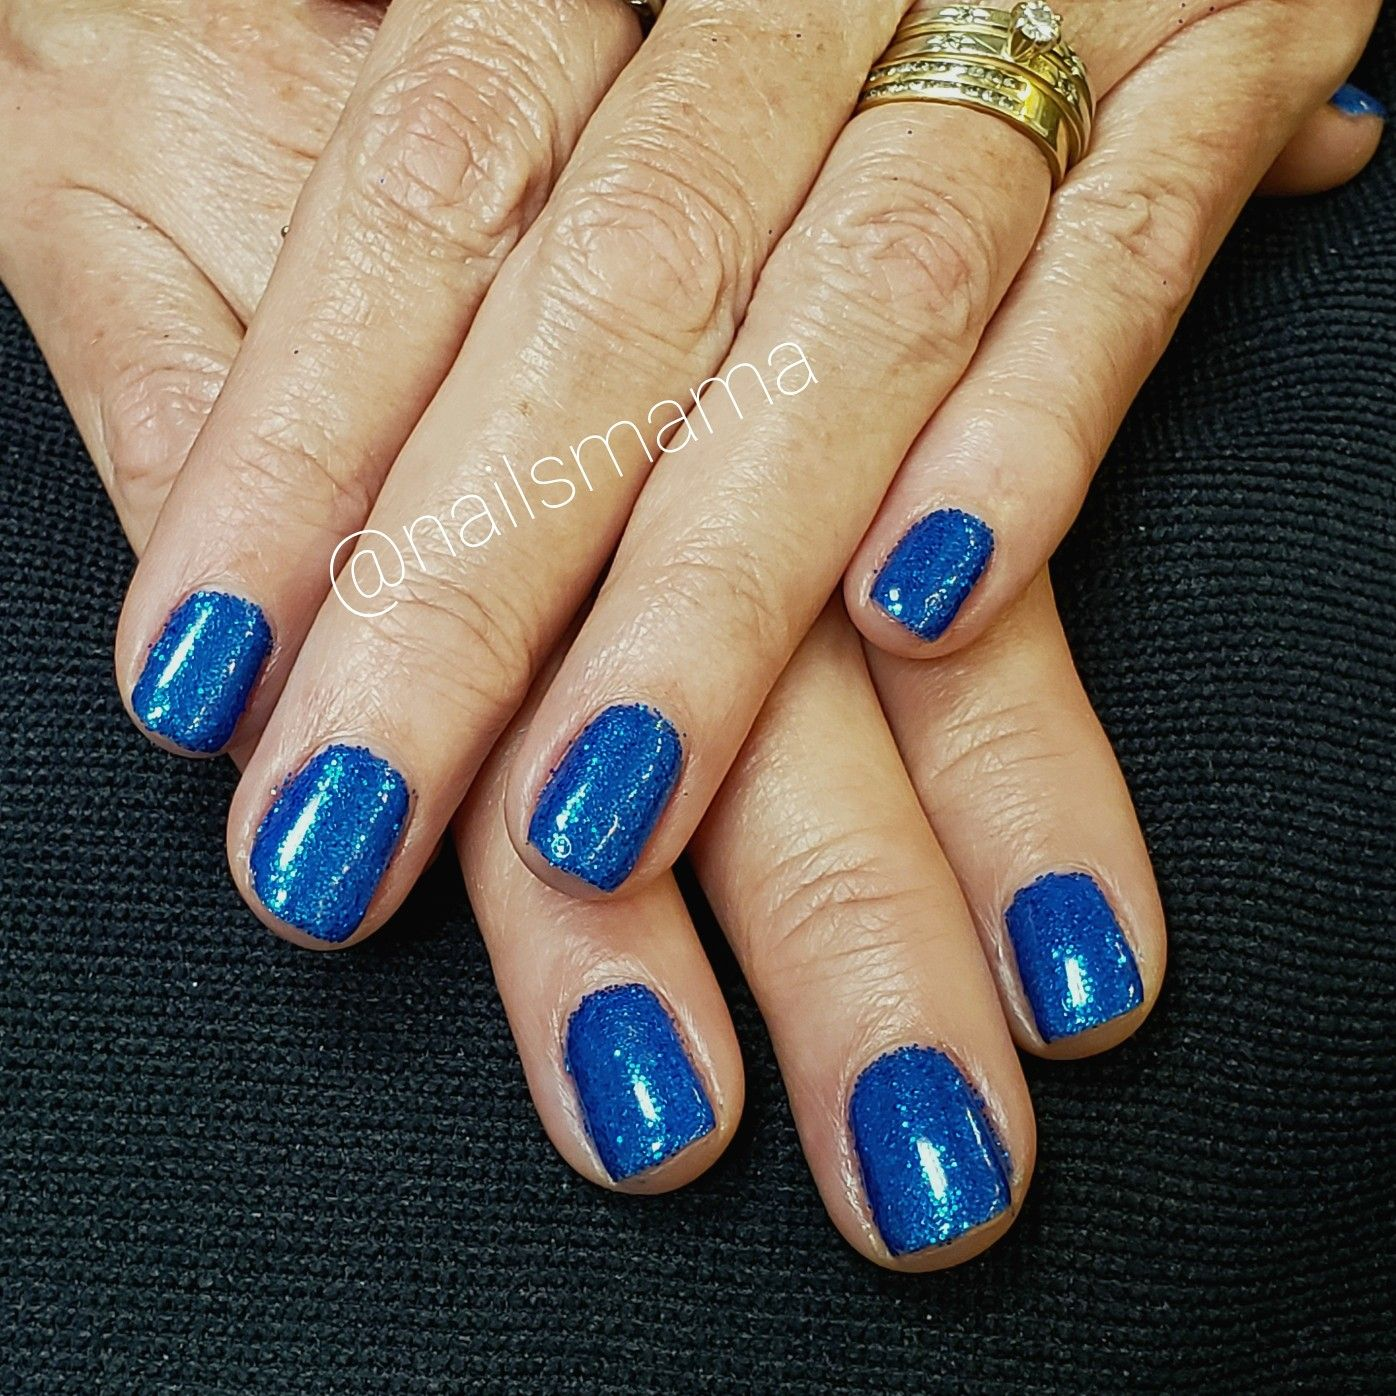 Blue Glitter Gel Nails Short Glitter Gel Nails J Nails Gel Nails